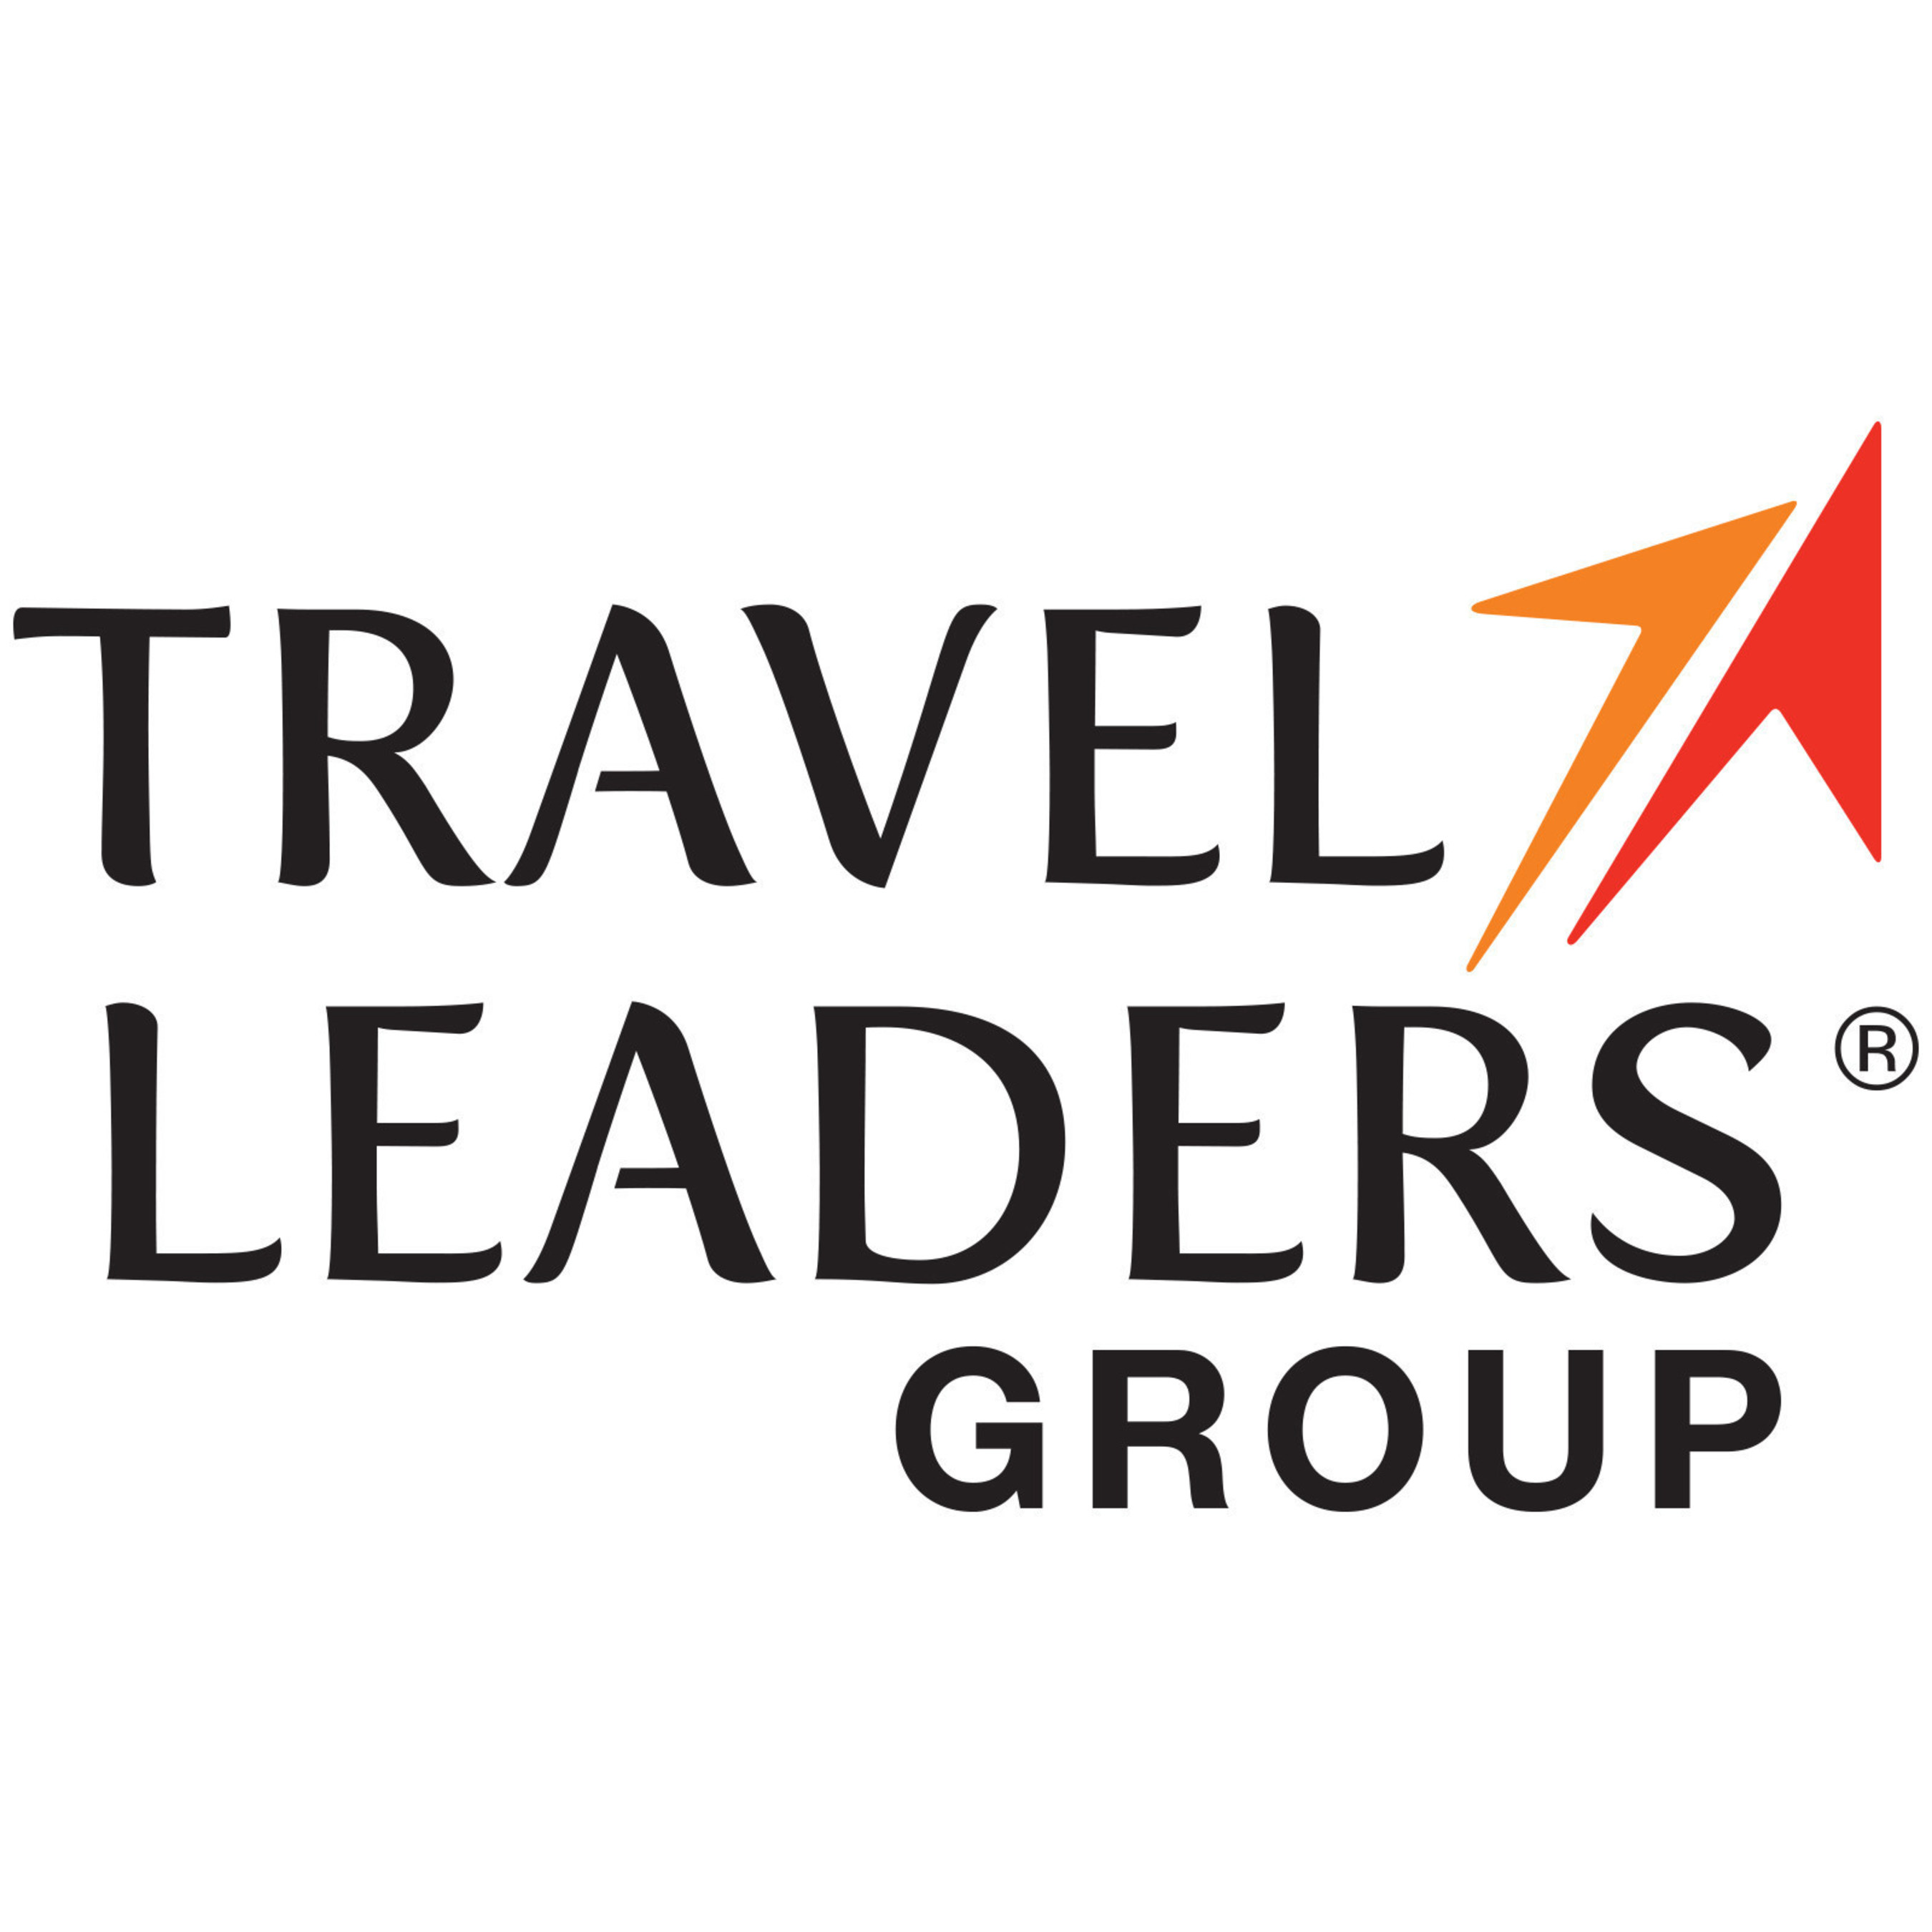 Travel Leaders Group Logo.